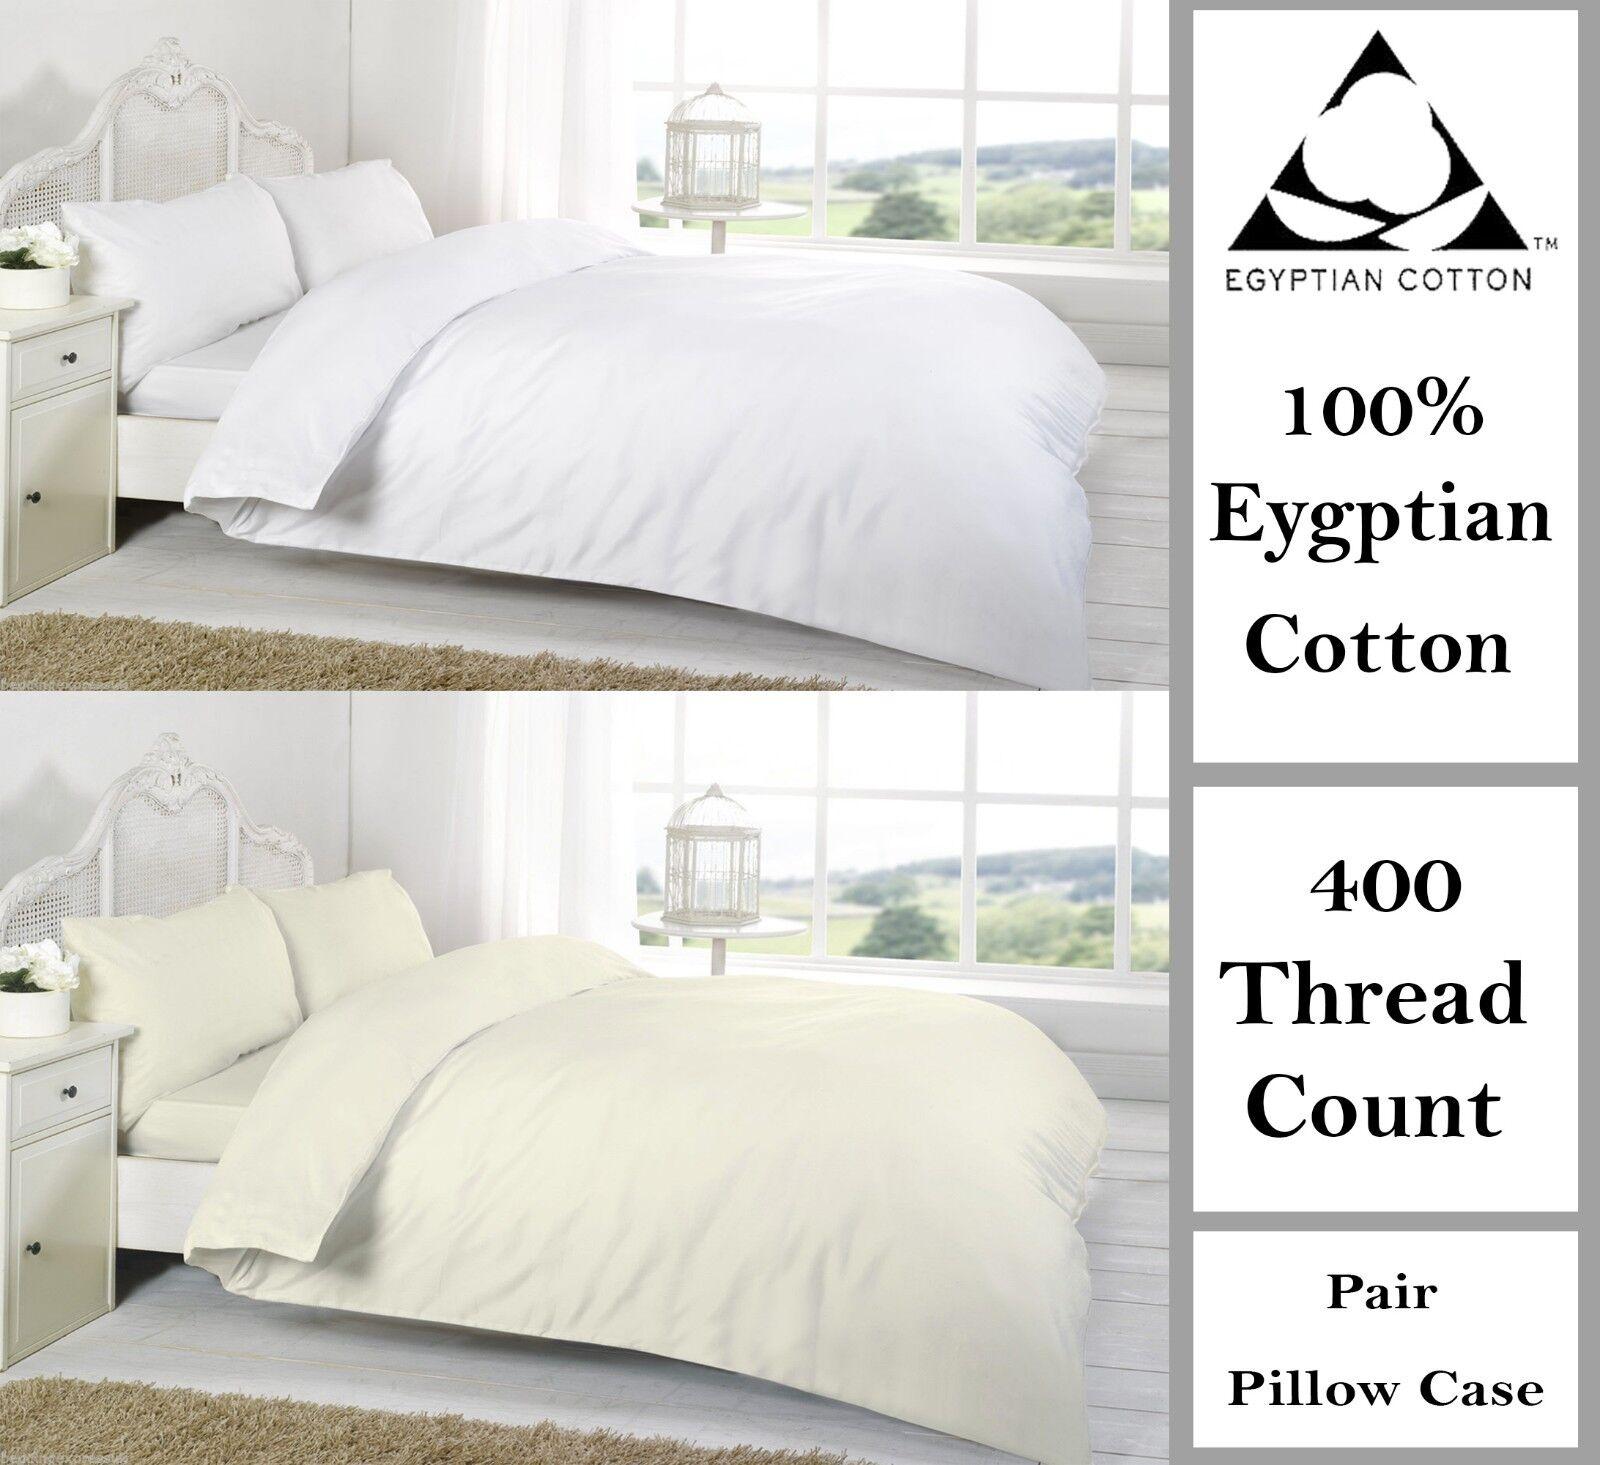 400 Thread Count Duvet Covers Set Egyptian Cotton Single Double Super King Größe